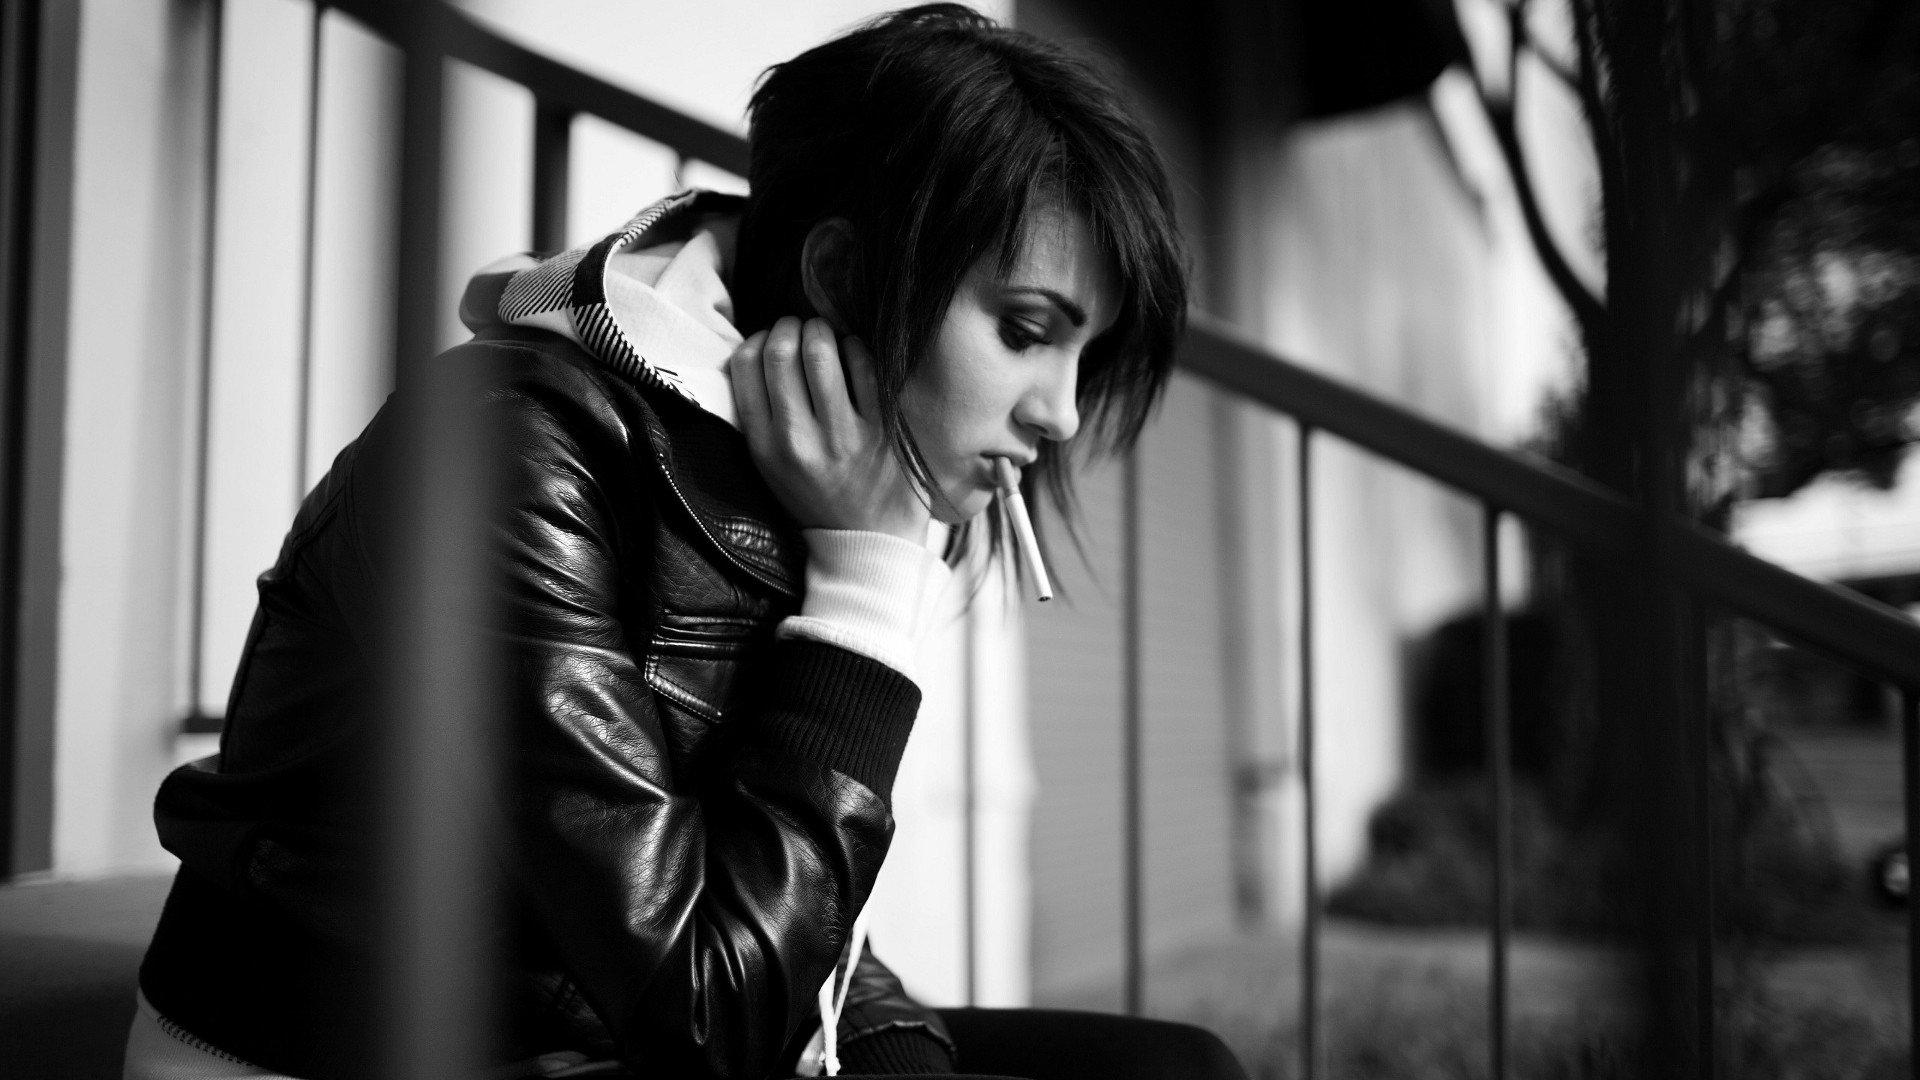 women, Monochrome, Cigarettes, Sitting, Sad Wallpaper